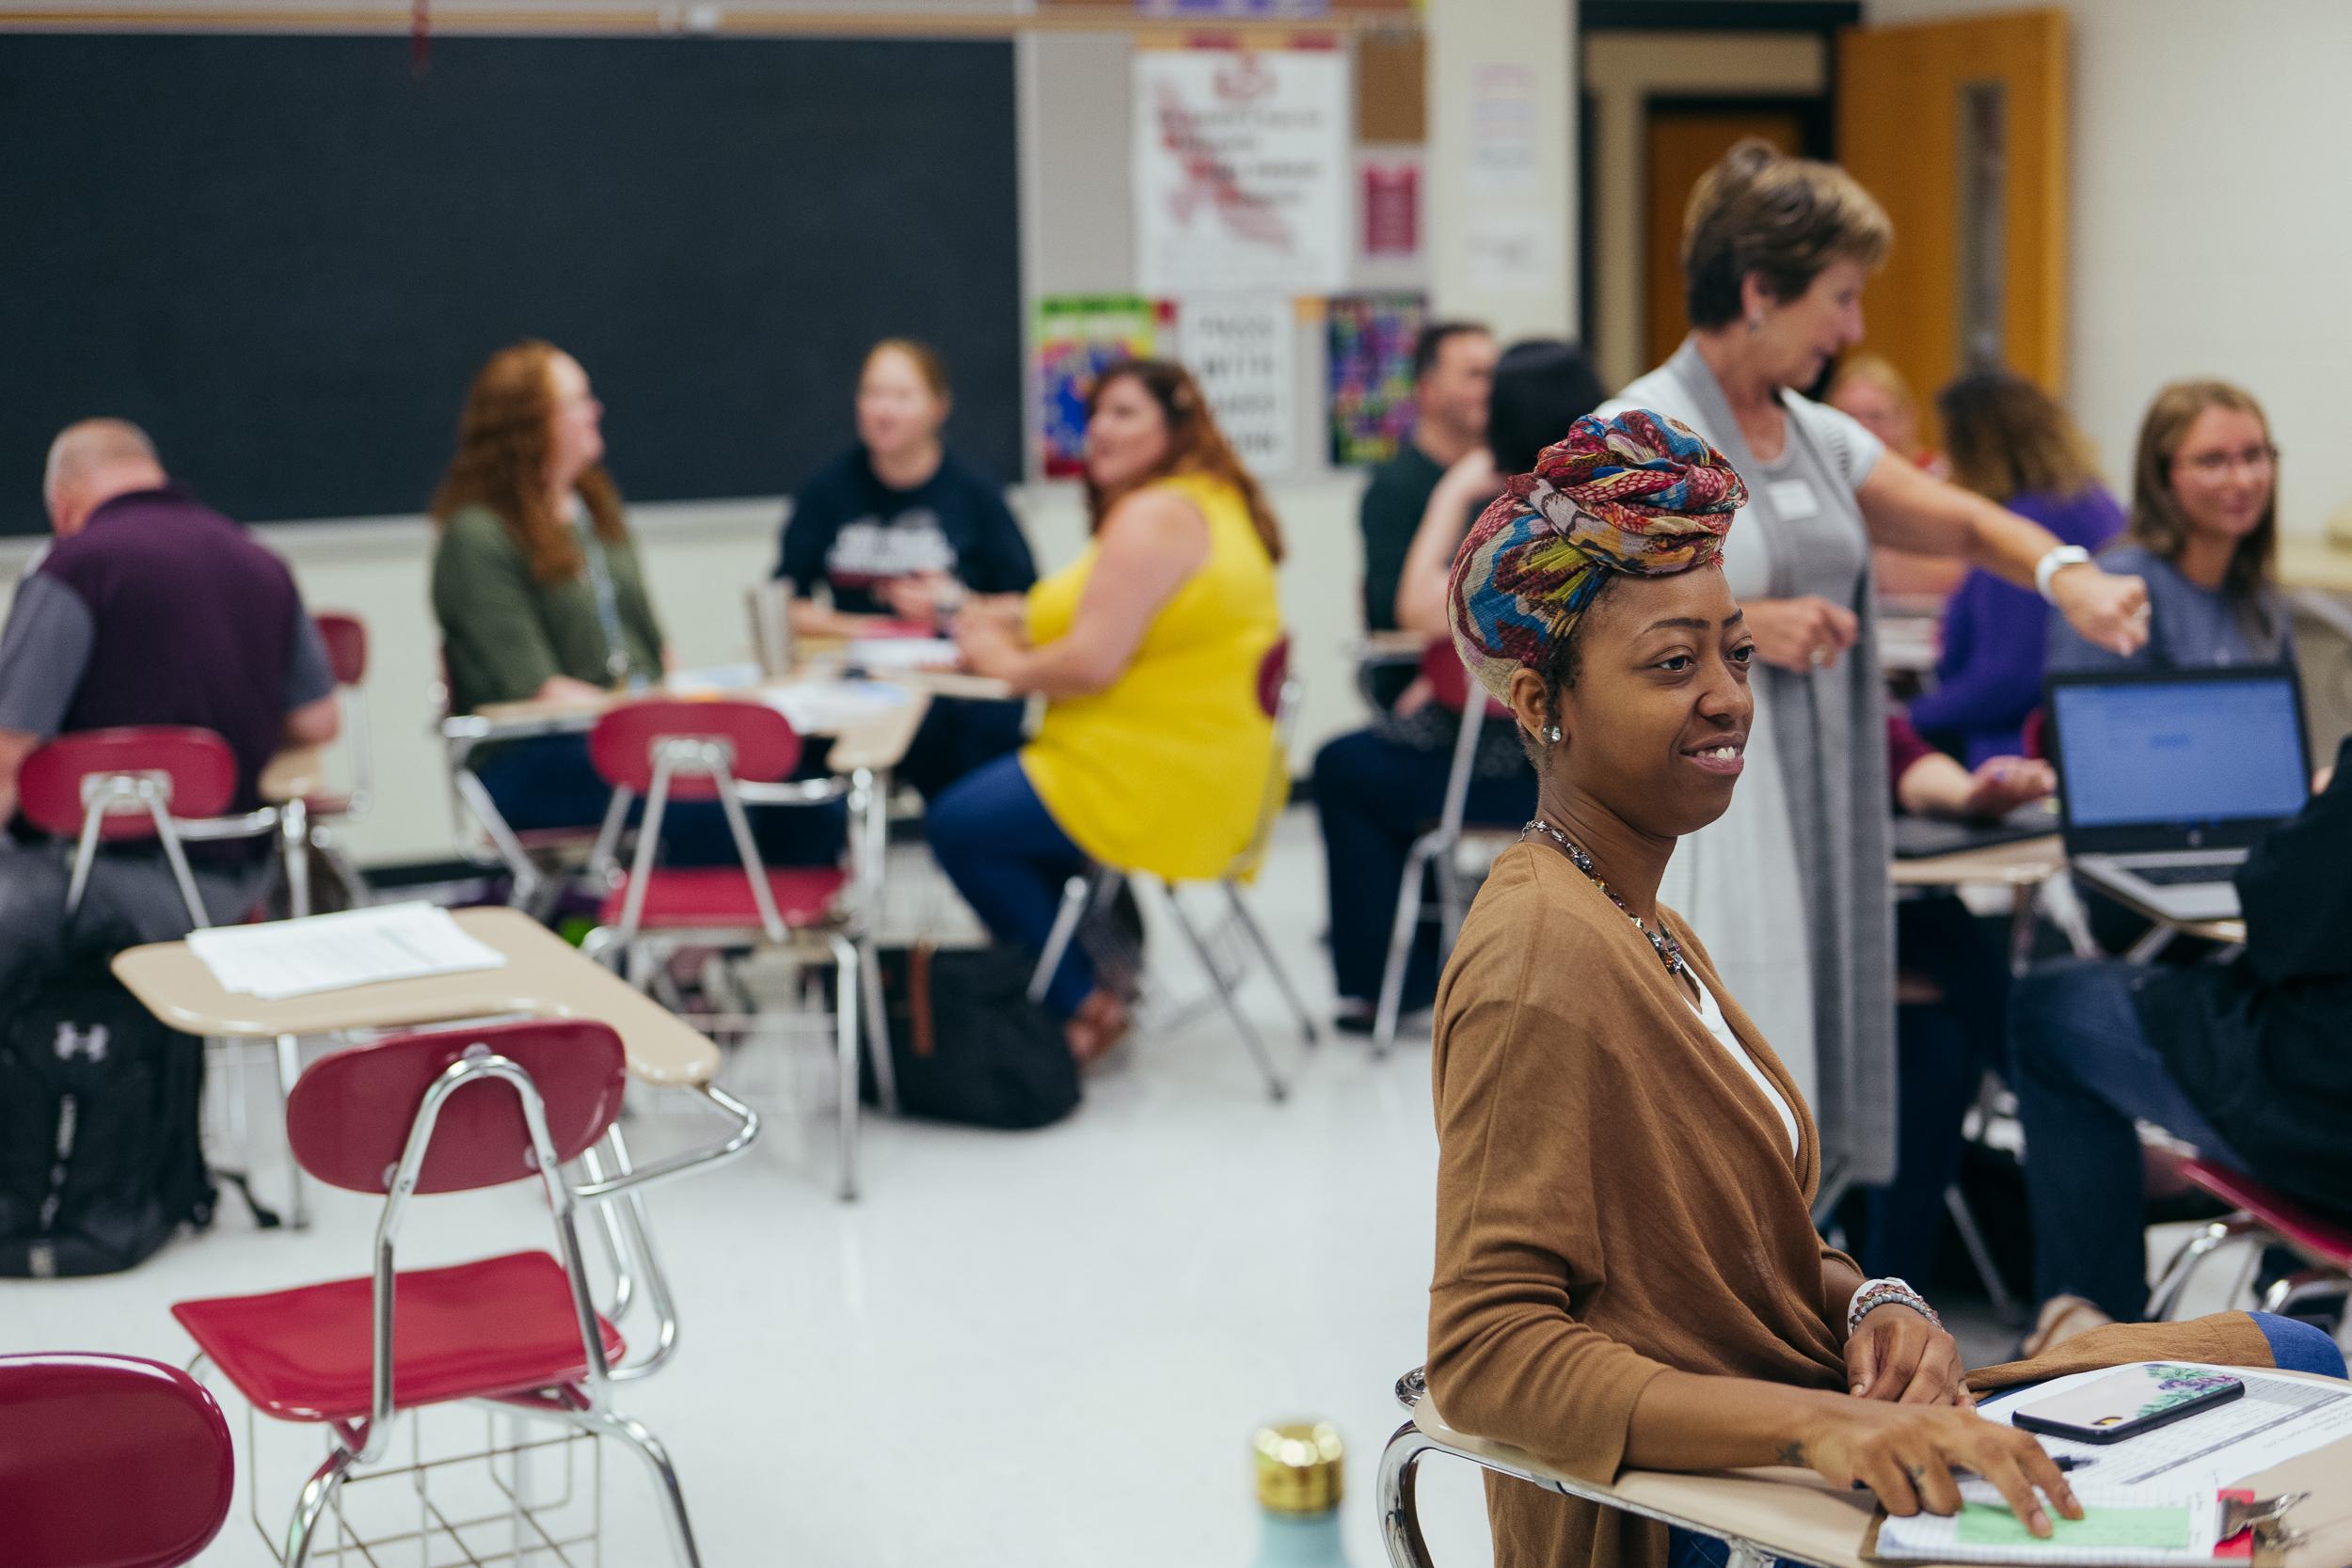 joyful teacher education photography emerging districts ©2019abigailbobophotography-23.jpg